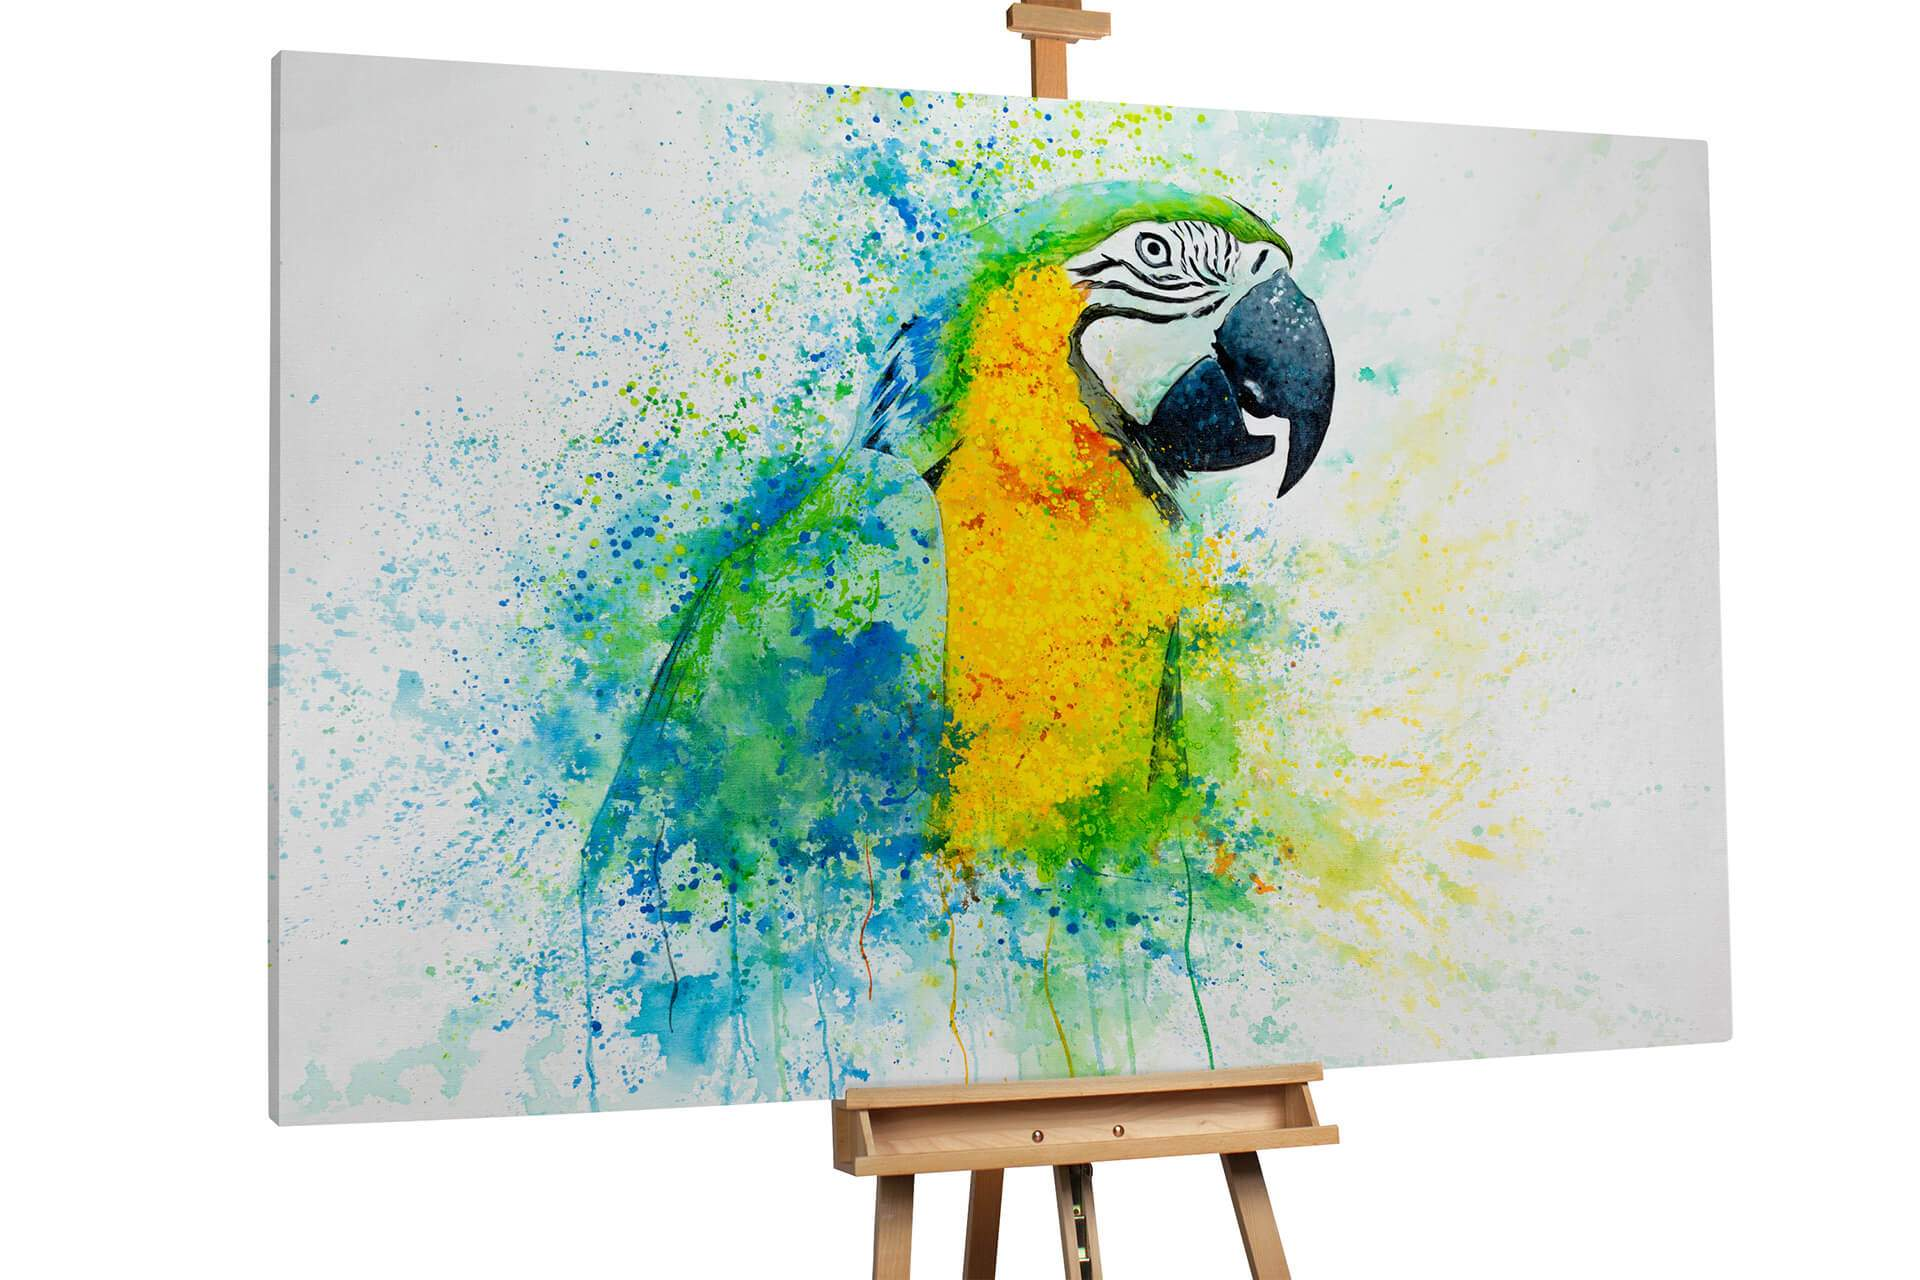 kl vogel papagei blau gelb gesang modern acryl gemaelde oel bild 02